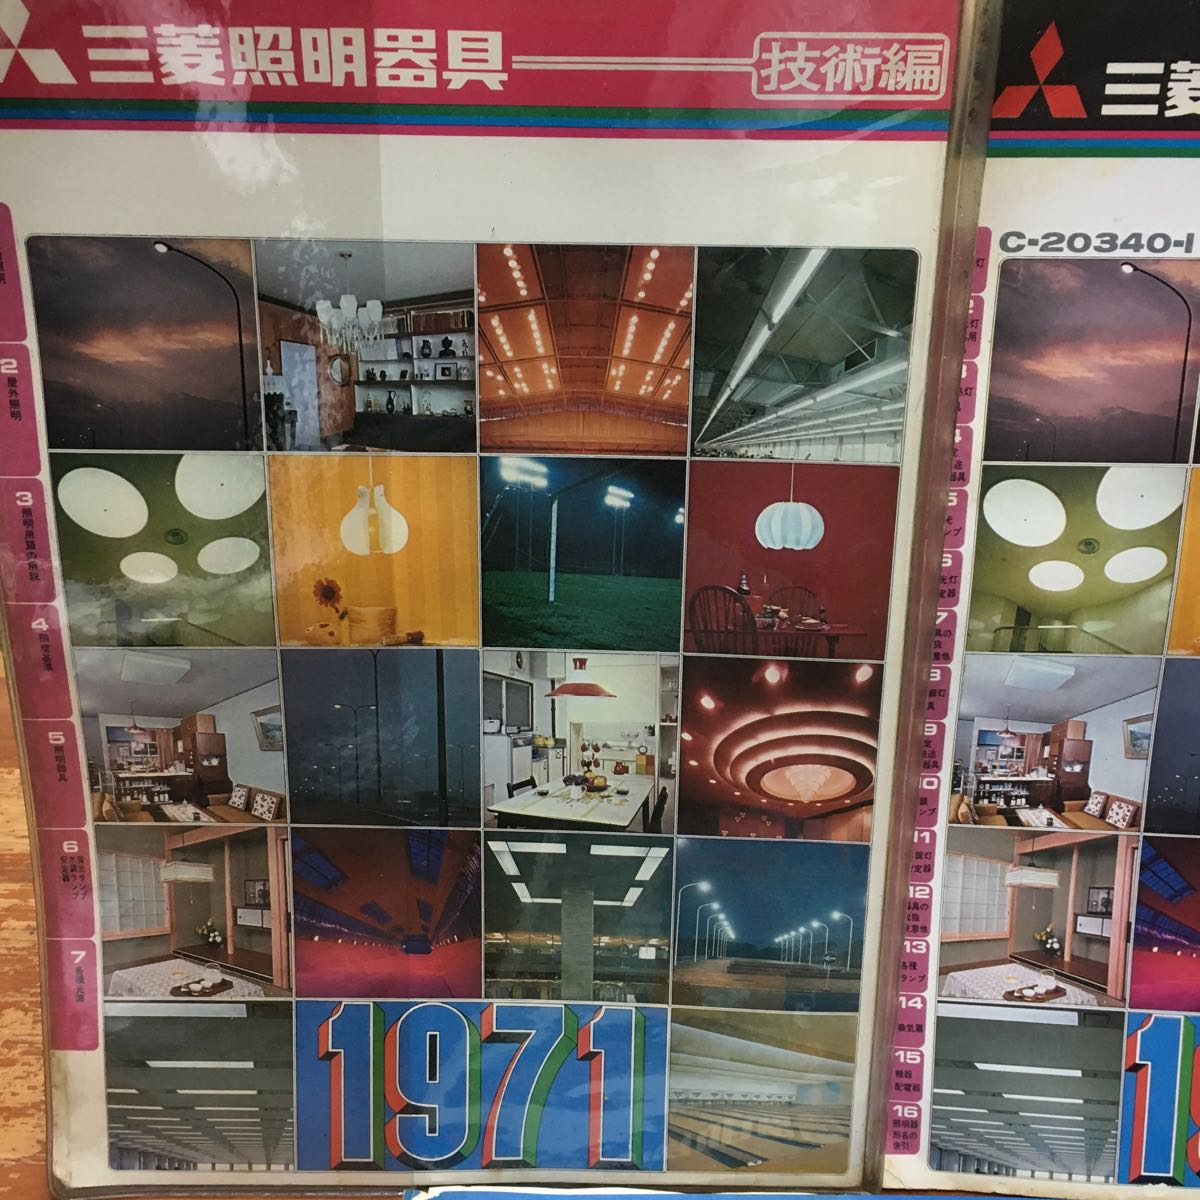 三菱照明器具/換気扇/カタログ/1971年・姿図集・照明器具技術編_画像2